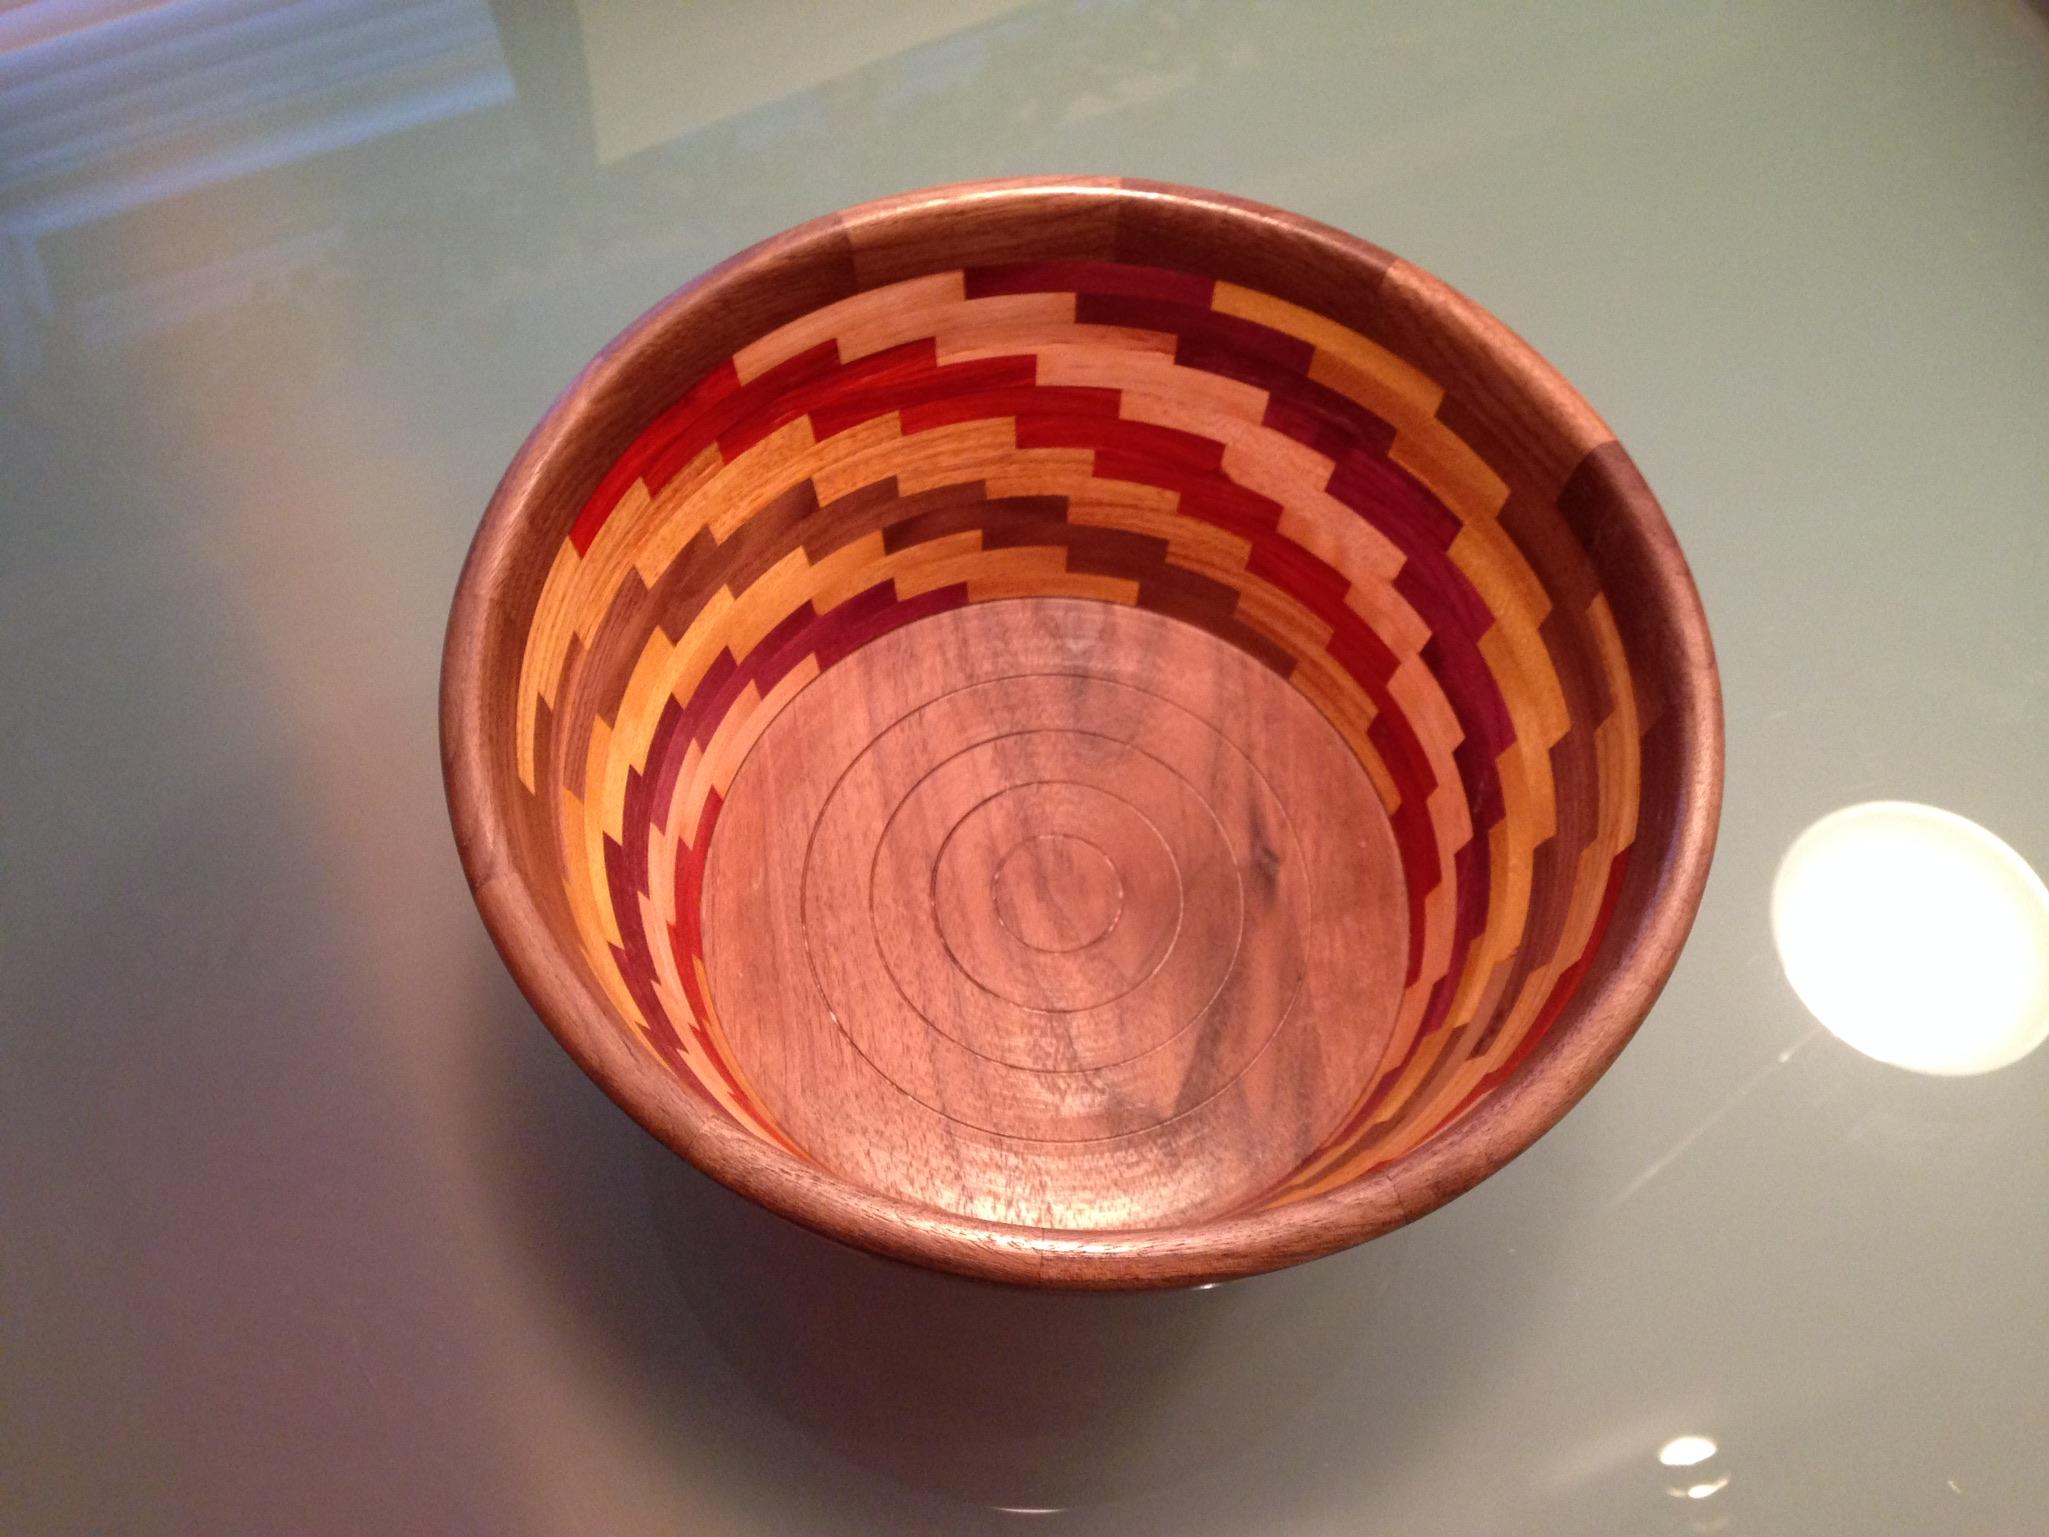 RJC Wood Creations - Bowls (52).jpg